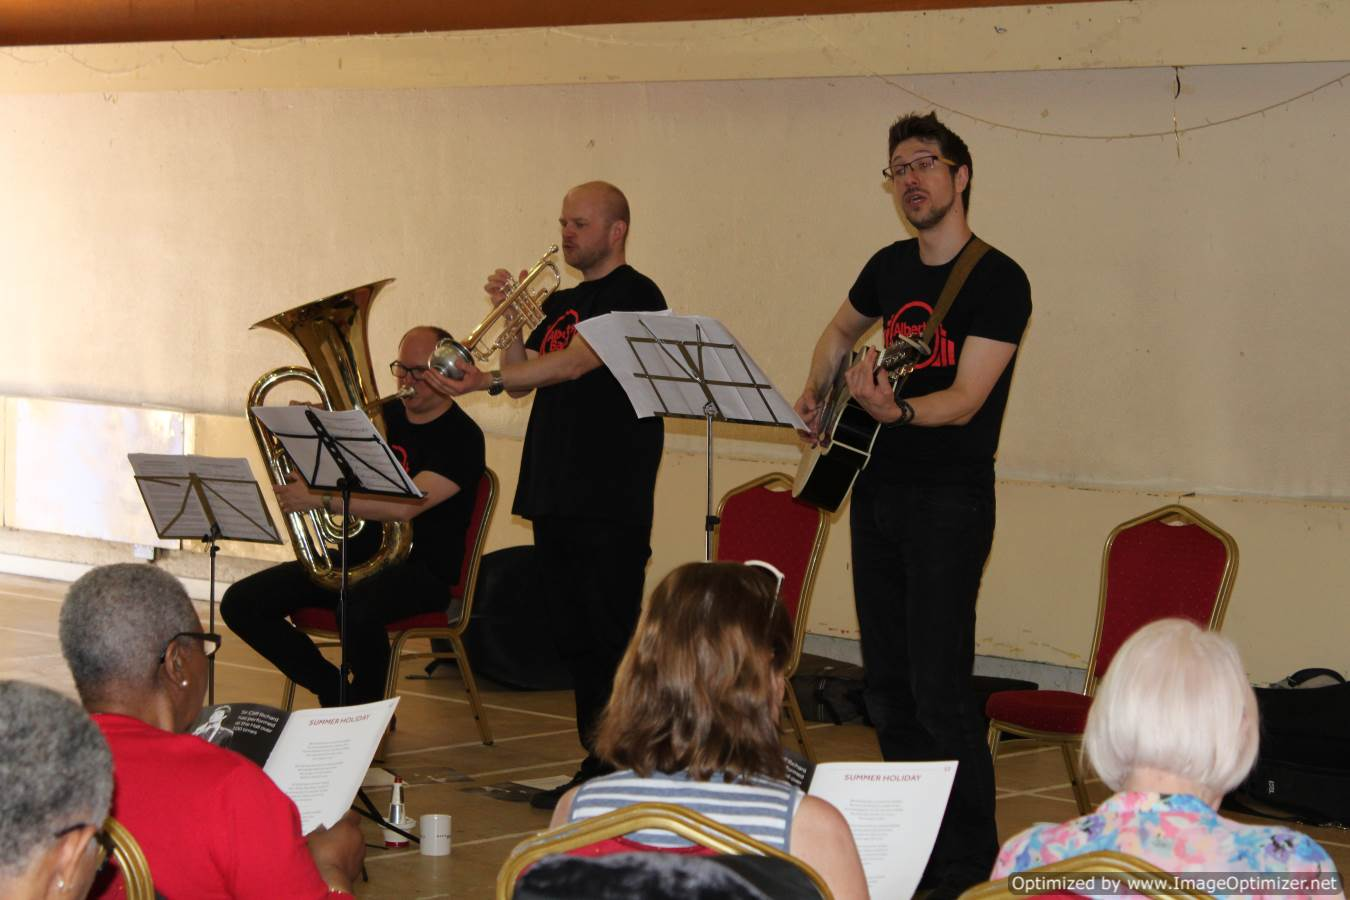 Albert Hall band perform at HOC